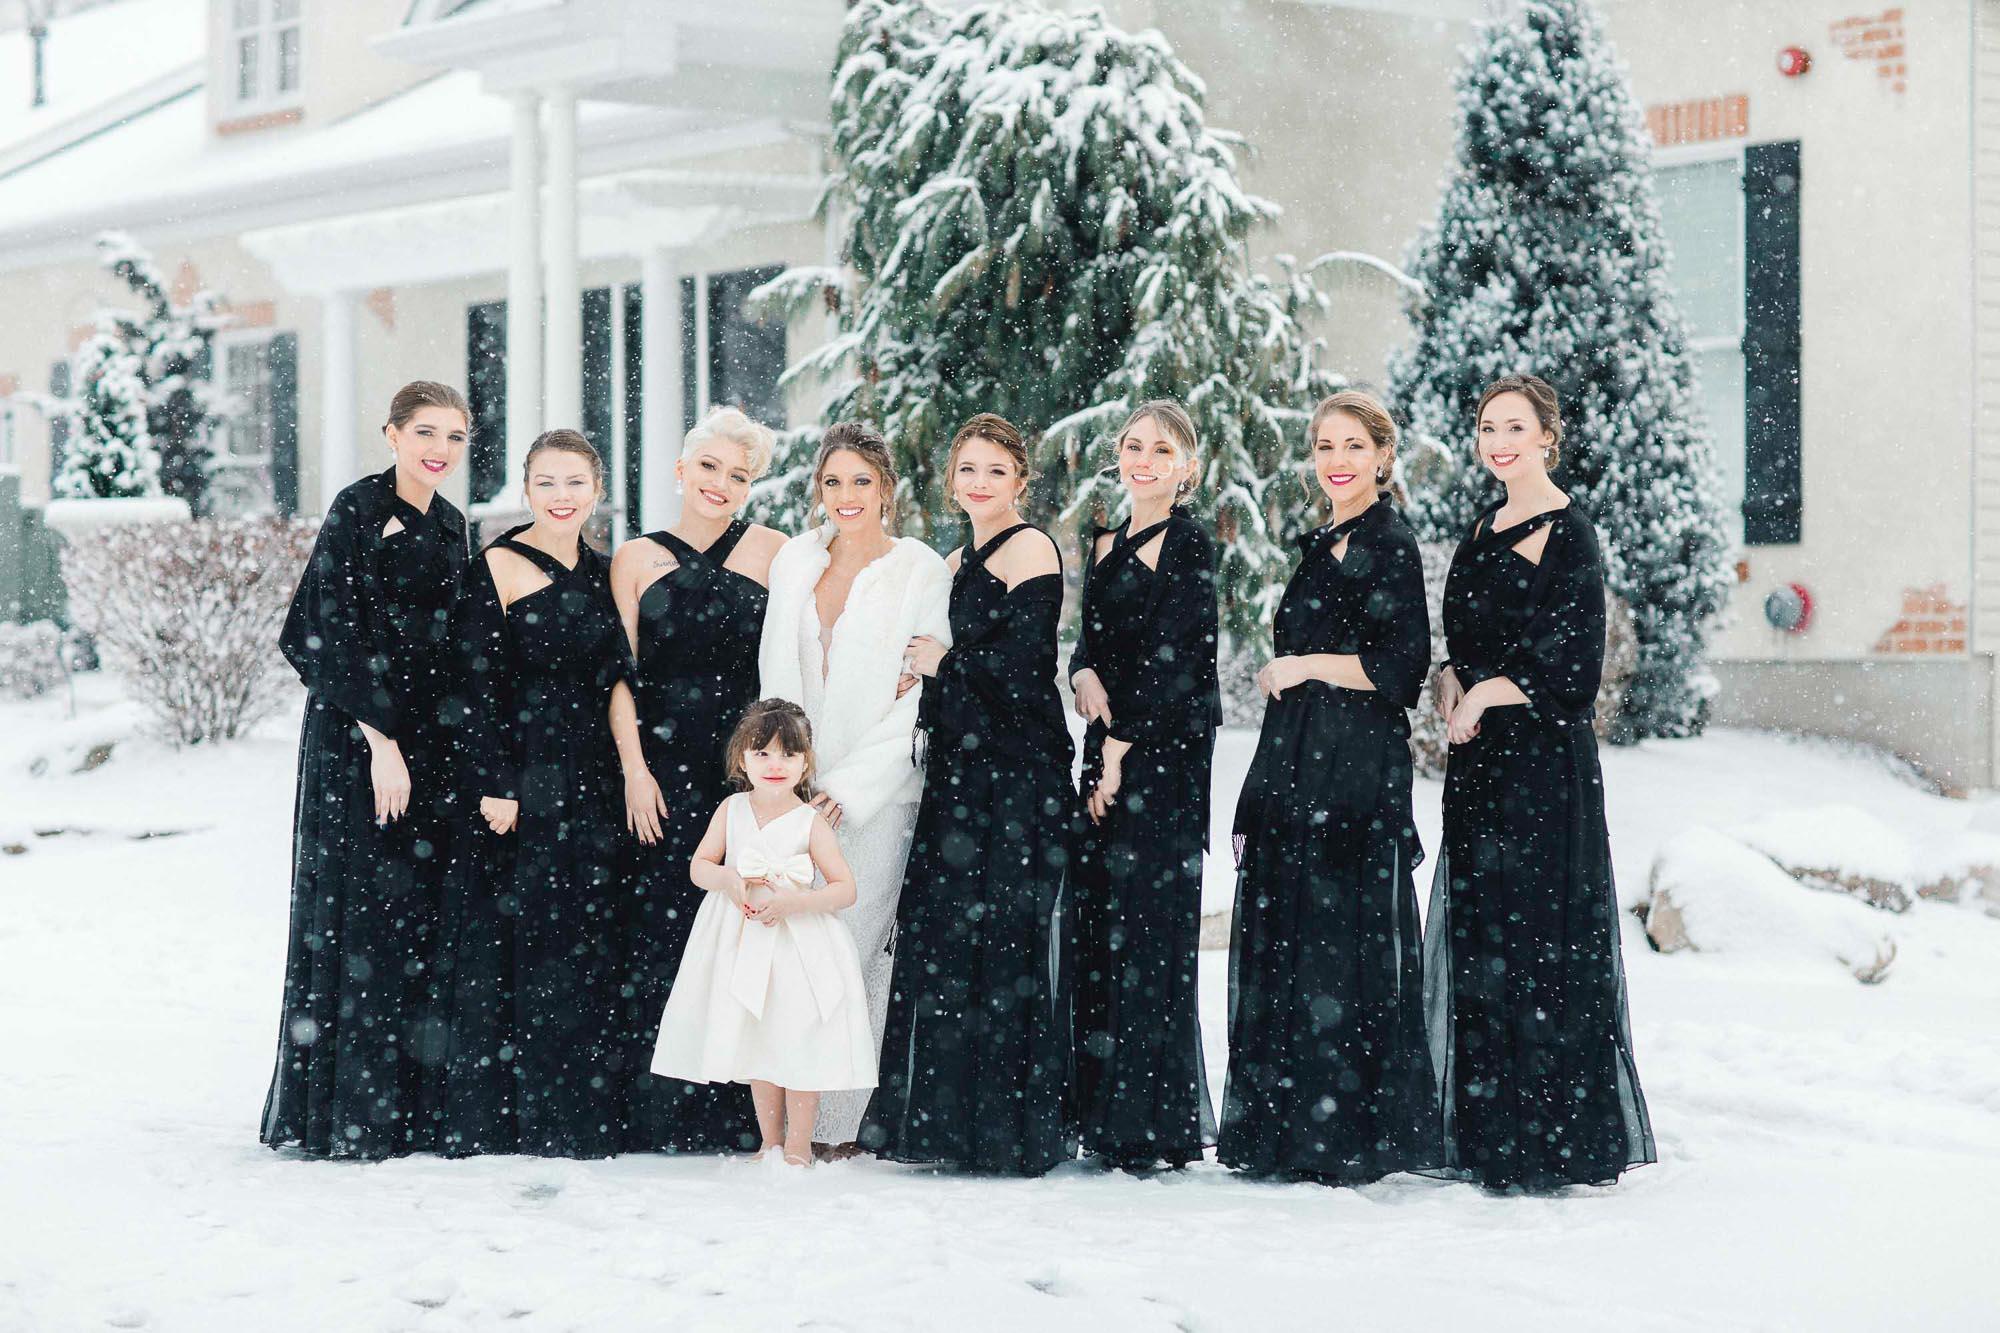 snowy-sand-springs-country-club-drums-pa-christmas-wedding-24162.jpg